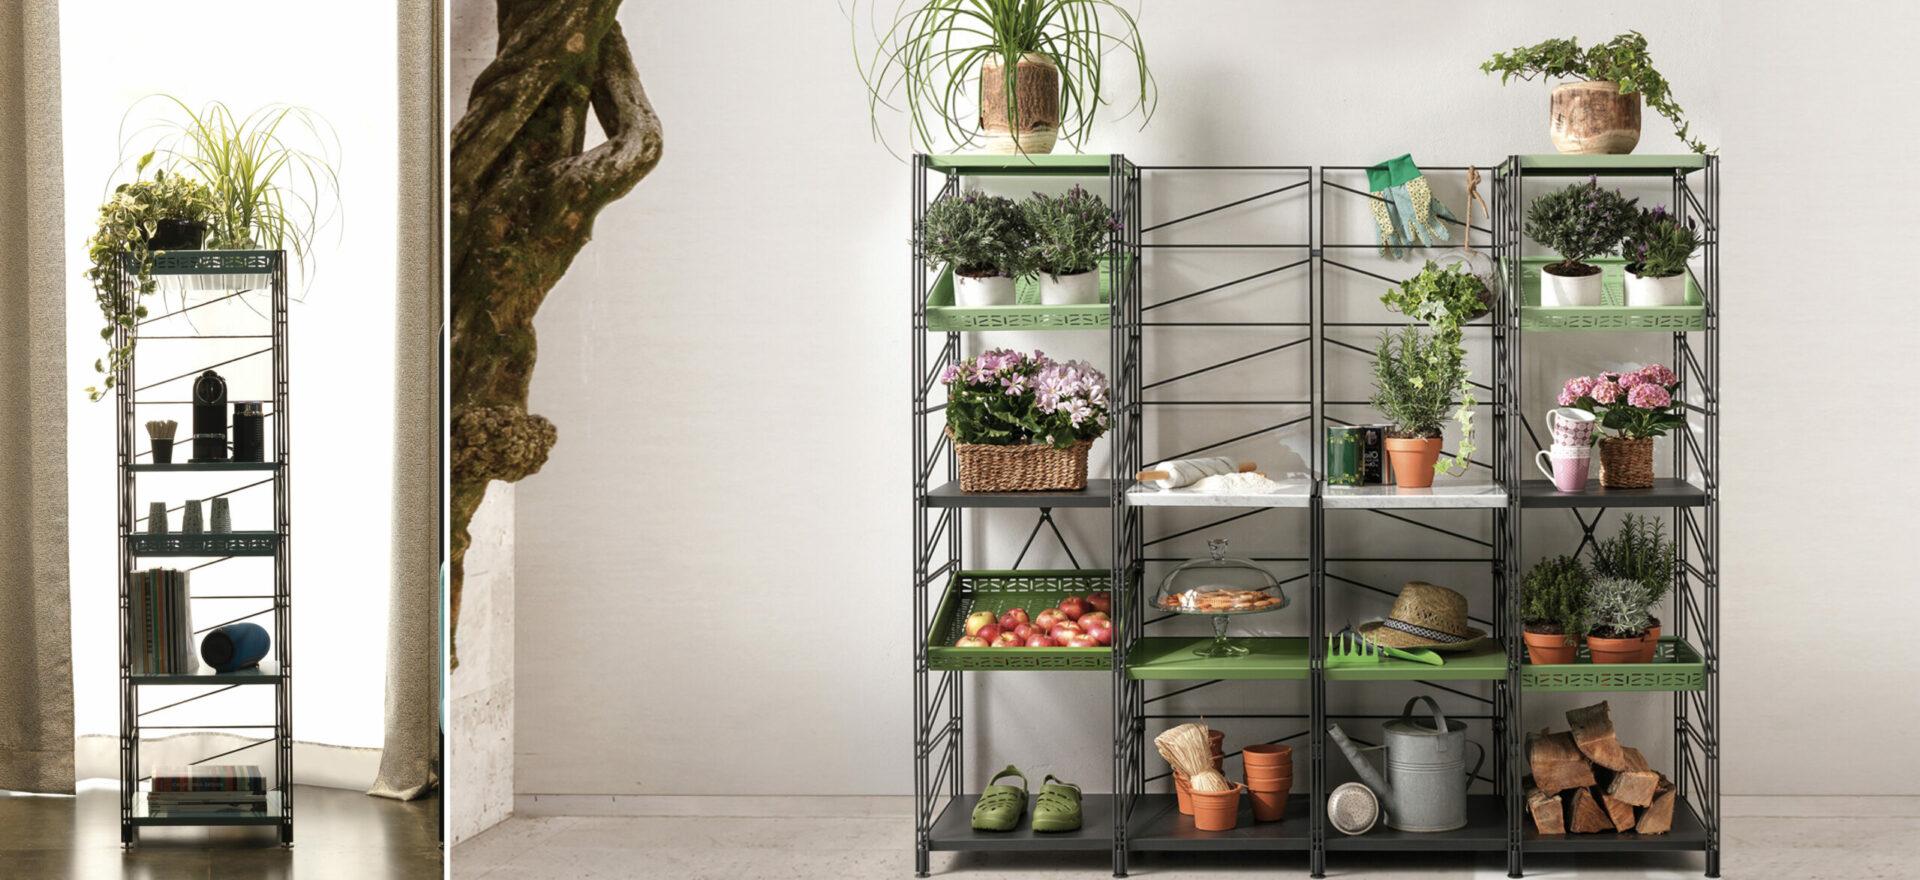 Socrate Outdoor_Outdoor Furniture_Black version__Caimi_Mario Trimarchi Design